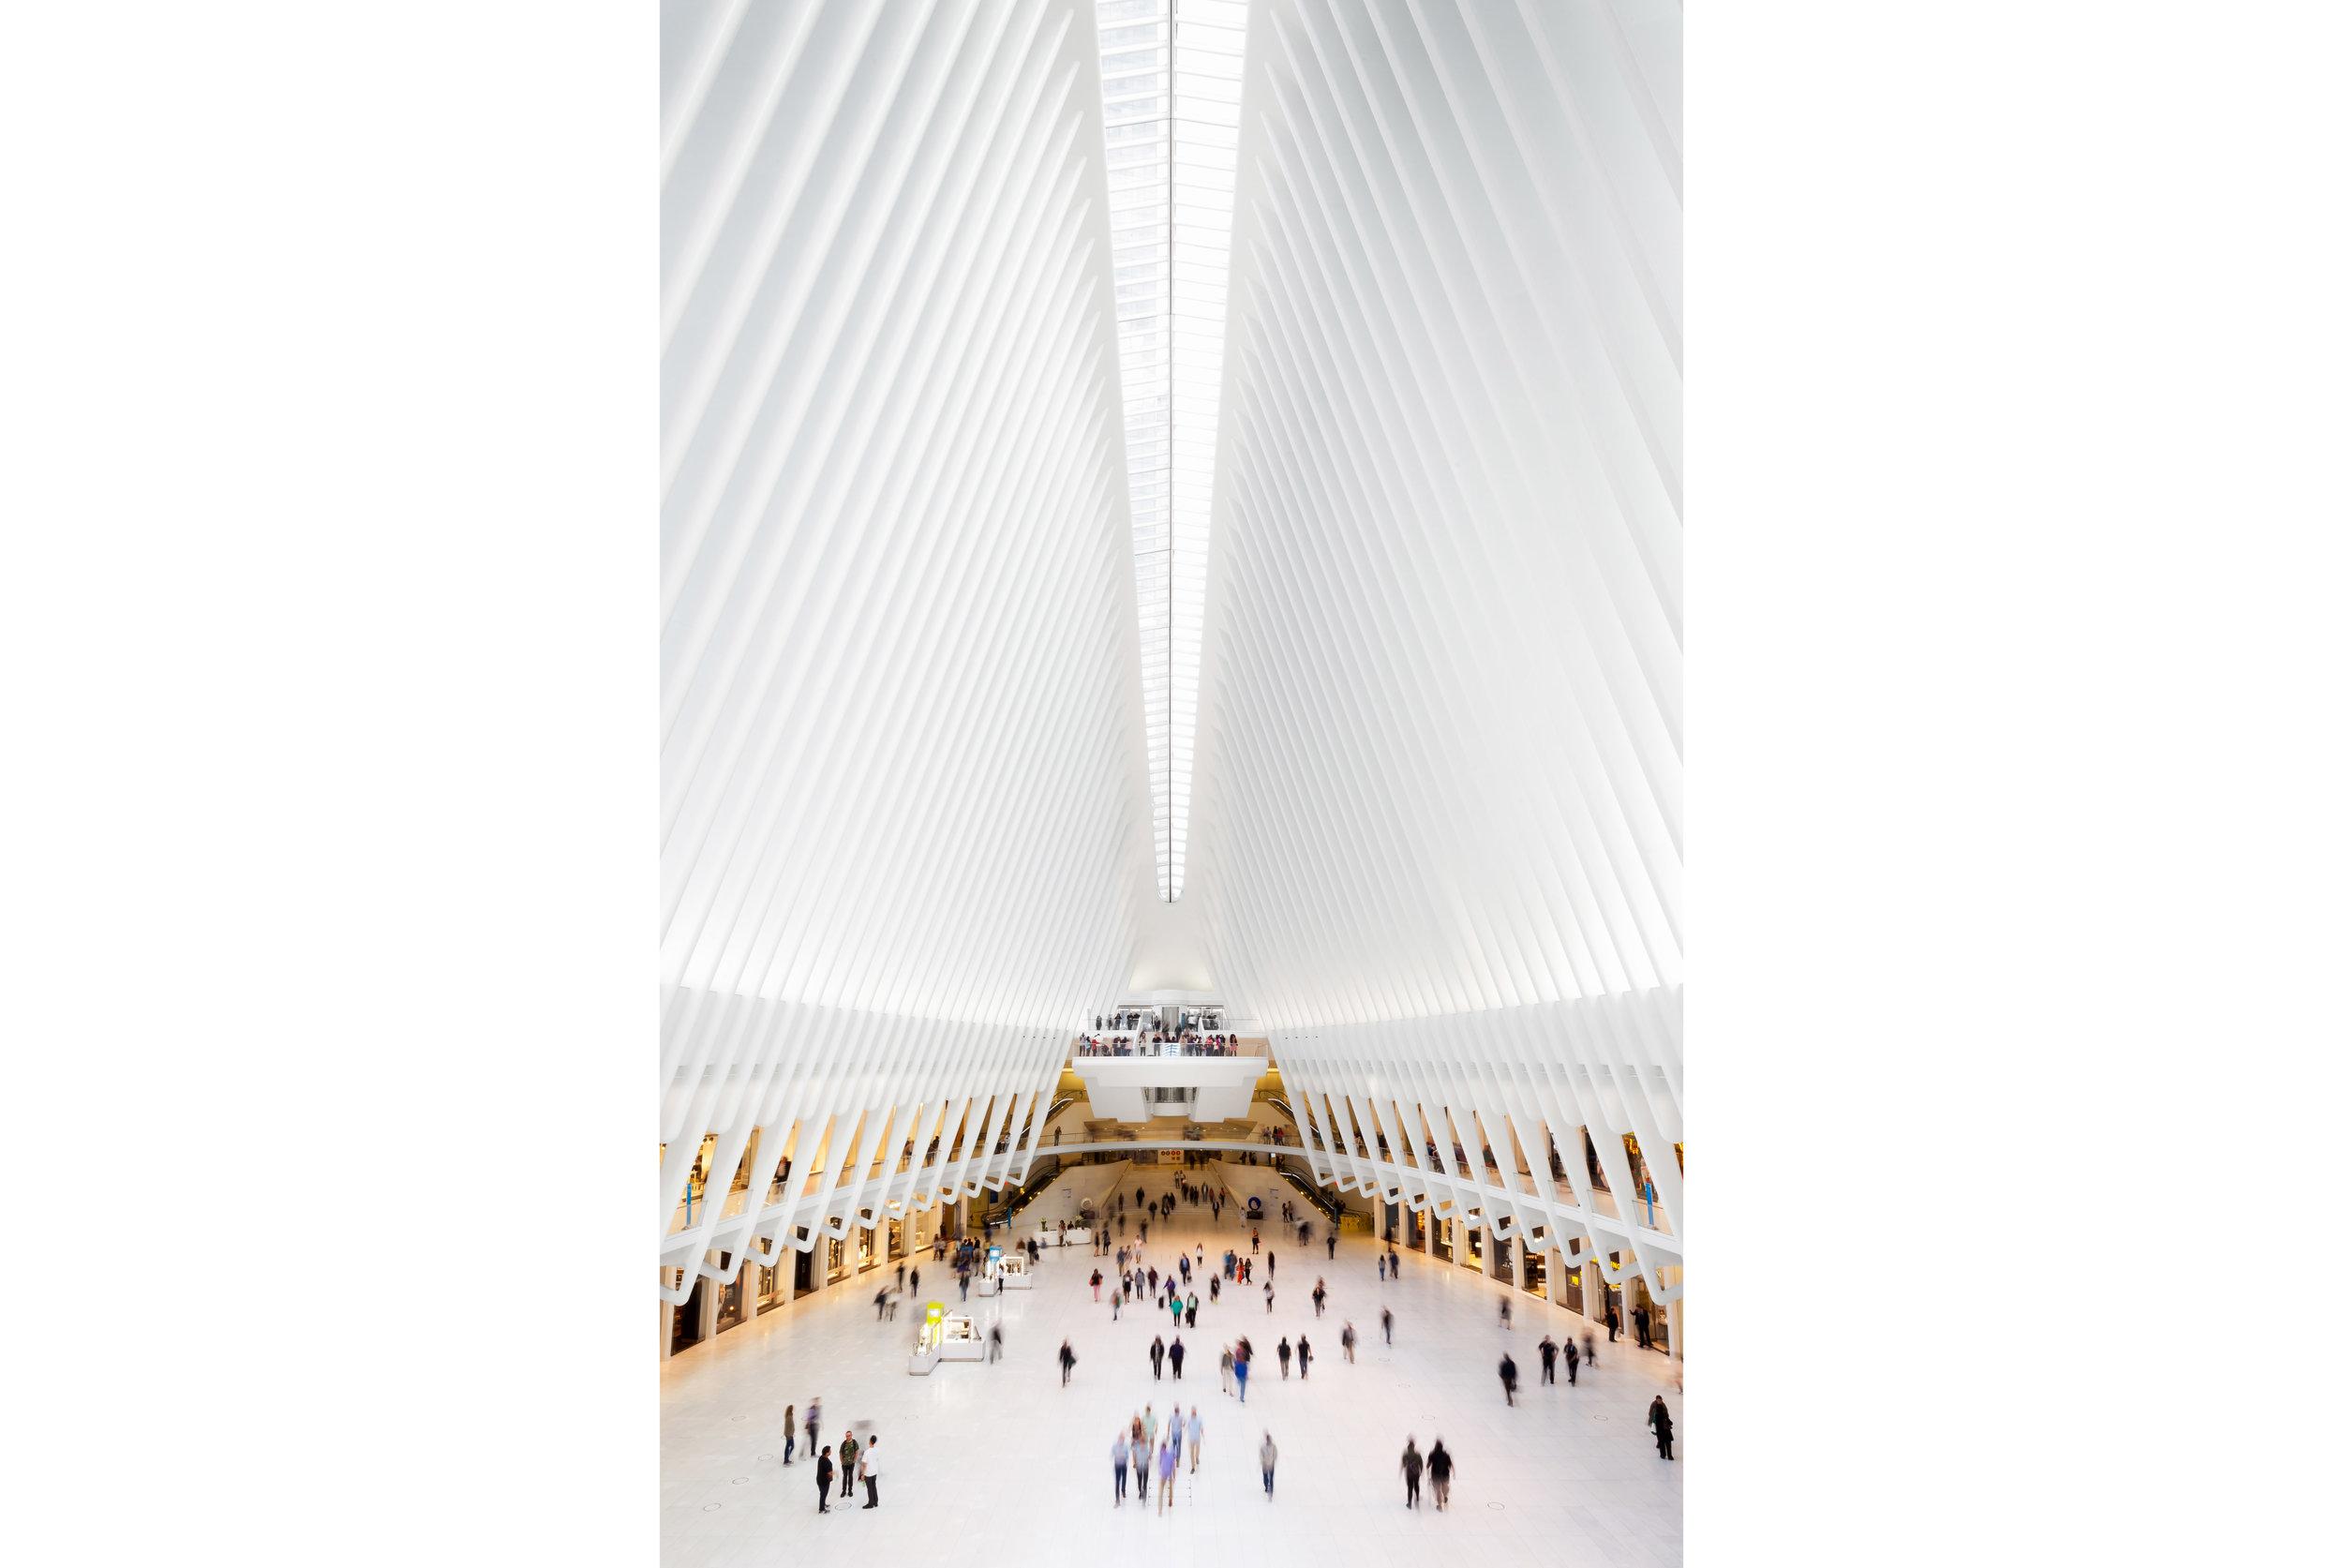 ©David+HigginsPhotography-New Yory Transport Hub.jpg